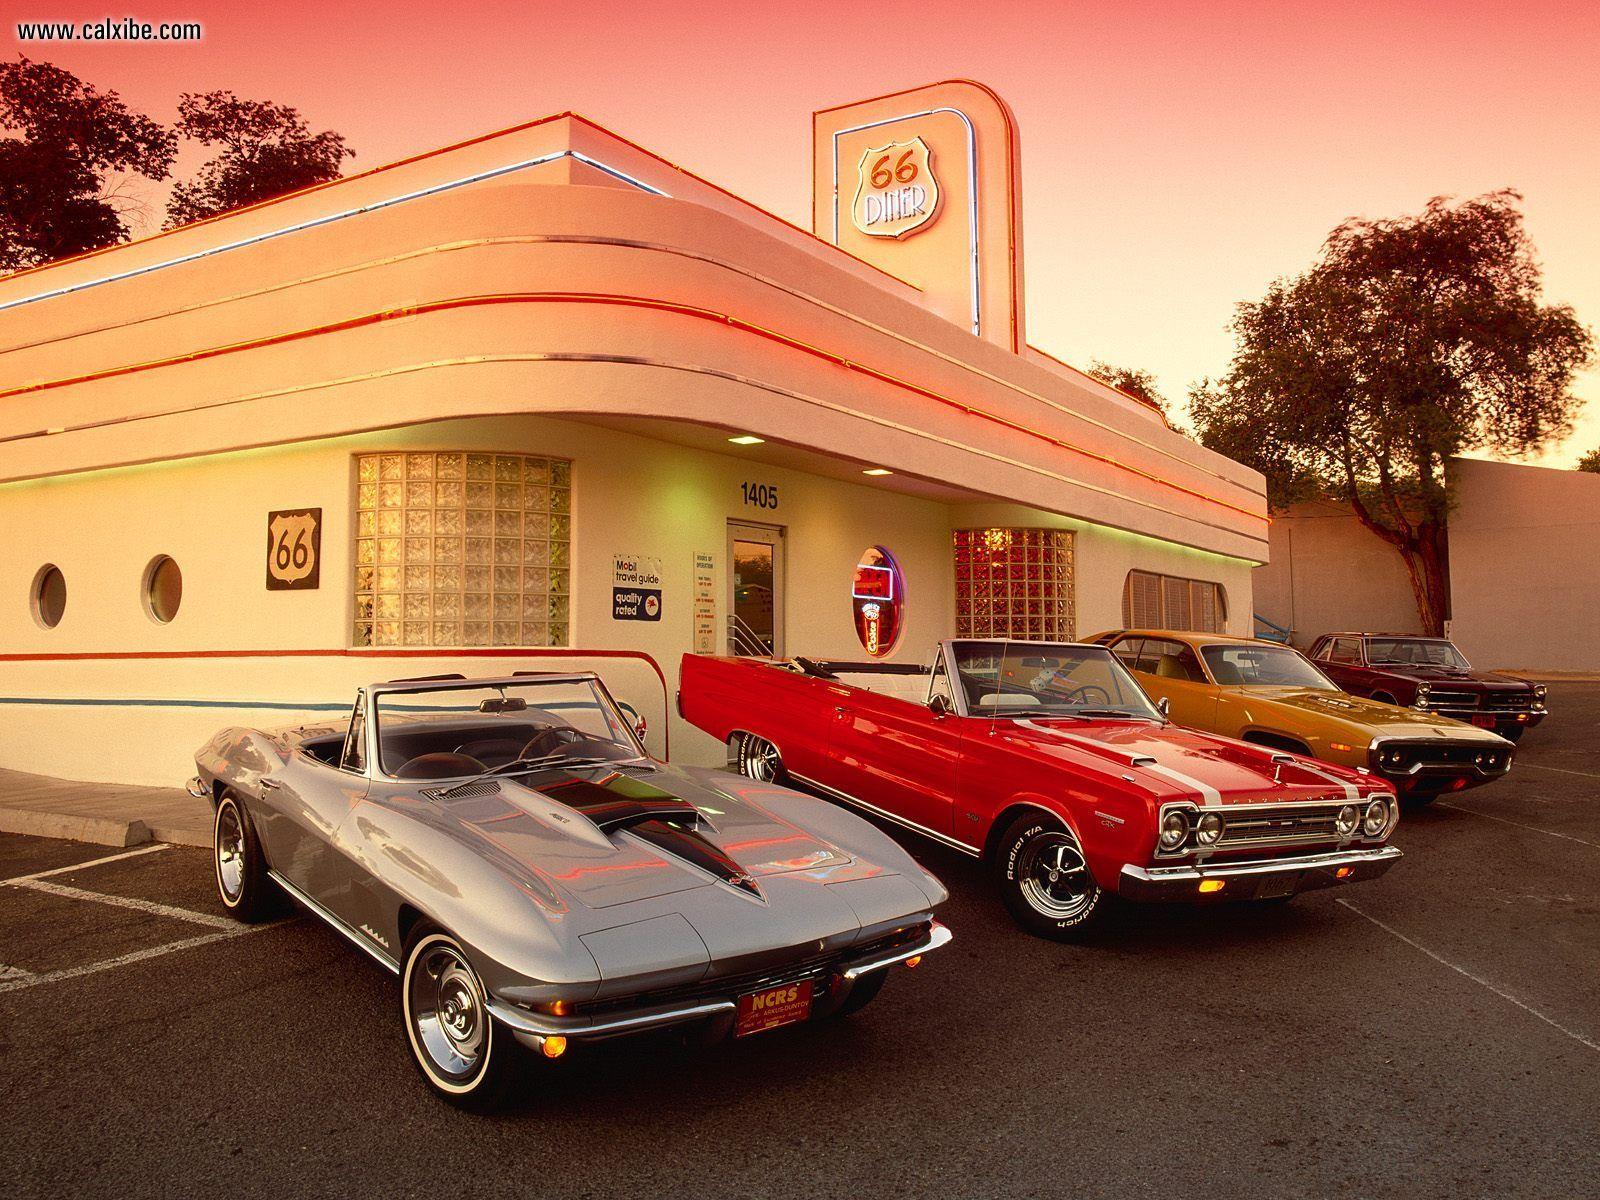 67 Corvette 427 67 Plymouth Belvedere 71 Plymouth Roadrunner 65 Pontiac GTO-1-